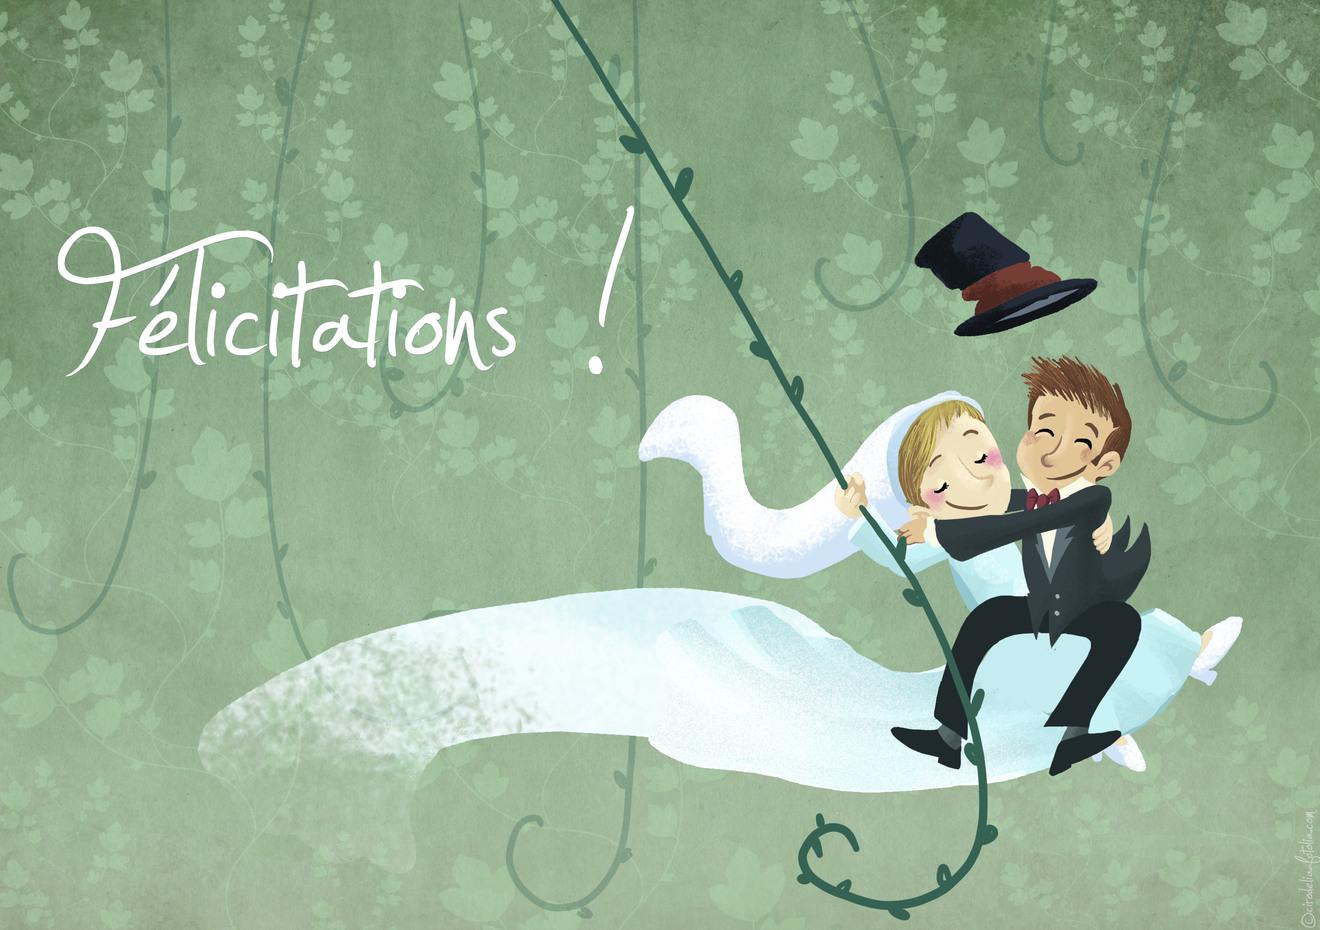 Mariage felicitation 2